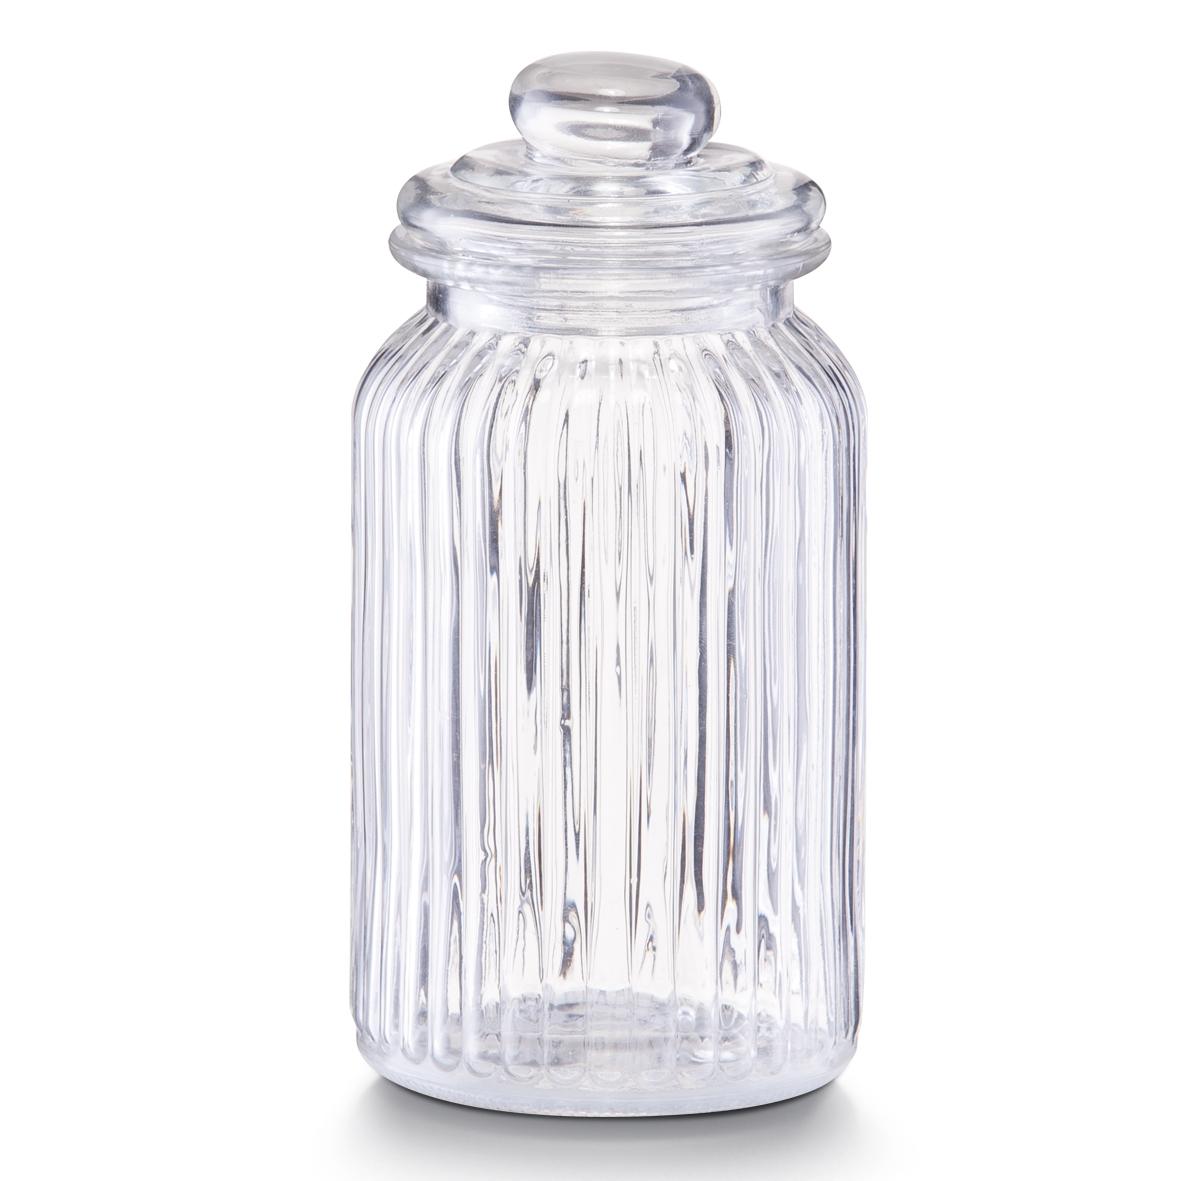 Borcan pentru depozitare din sticla Nostalgia, capac etans, 1200 ml, Ø 11xH22 cm